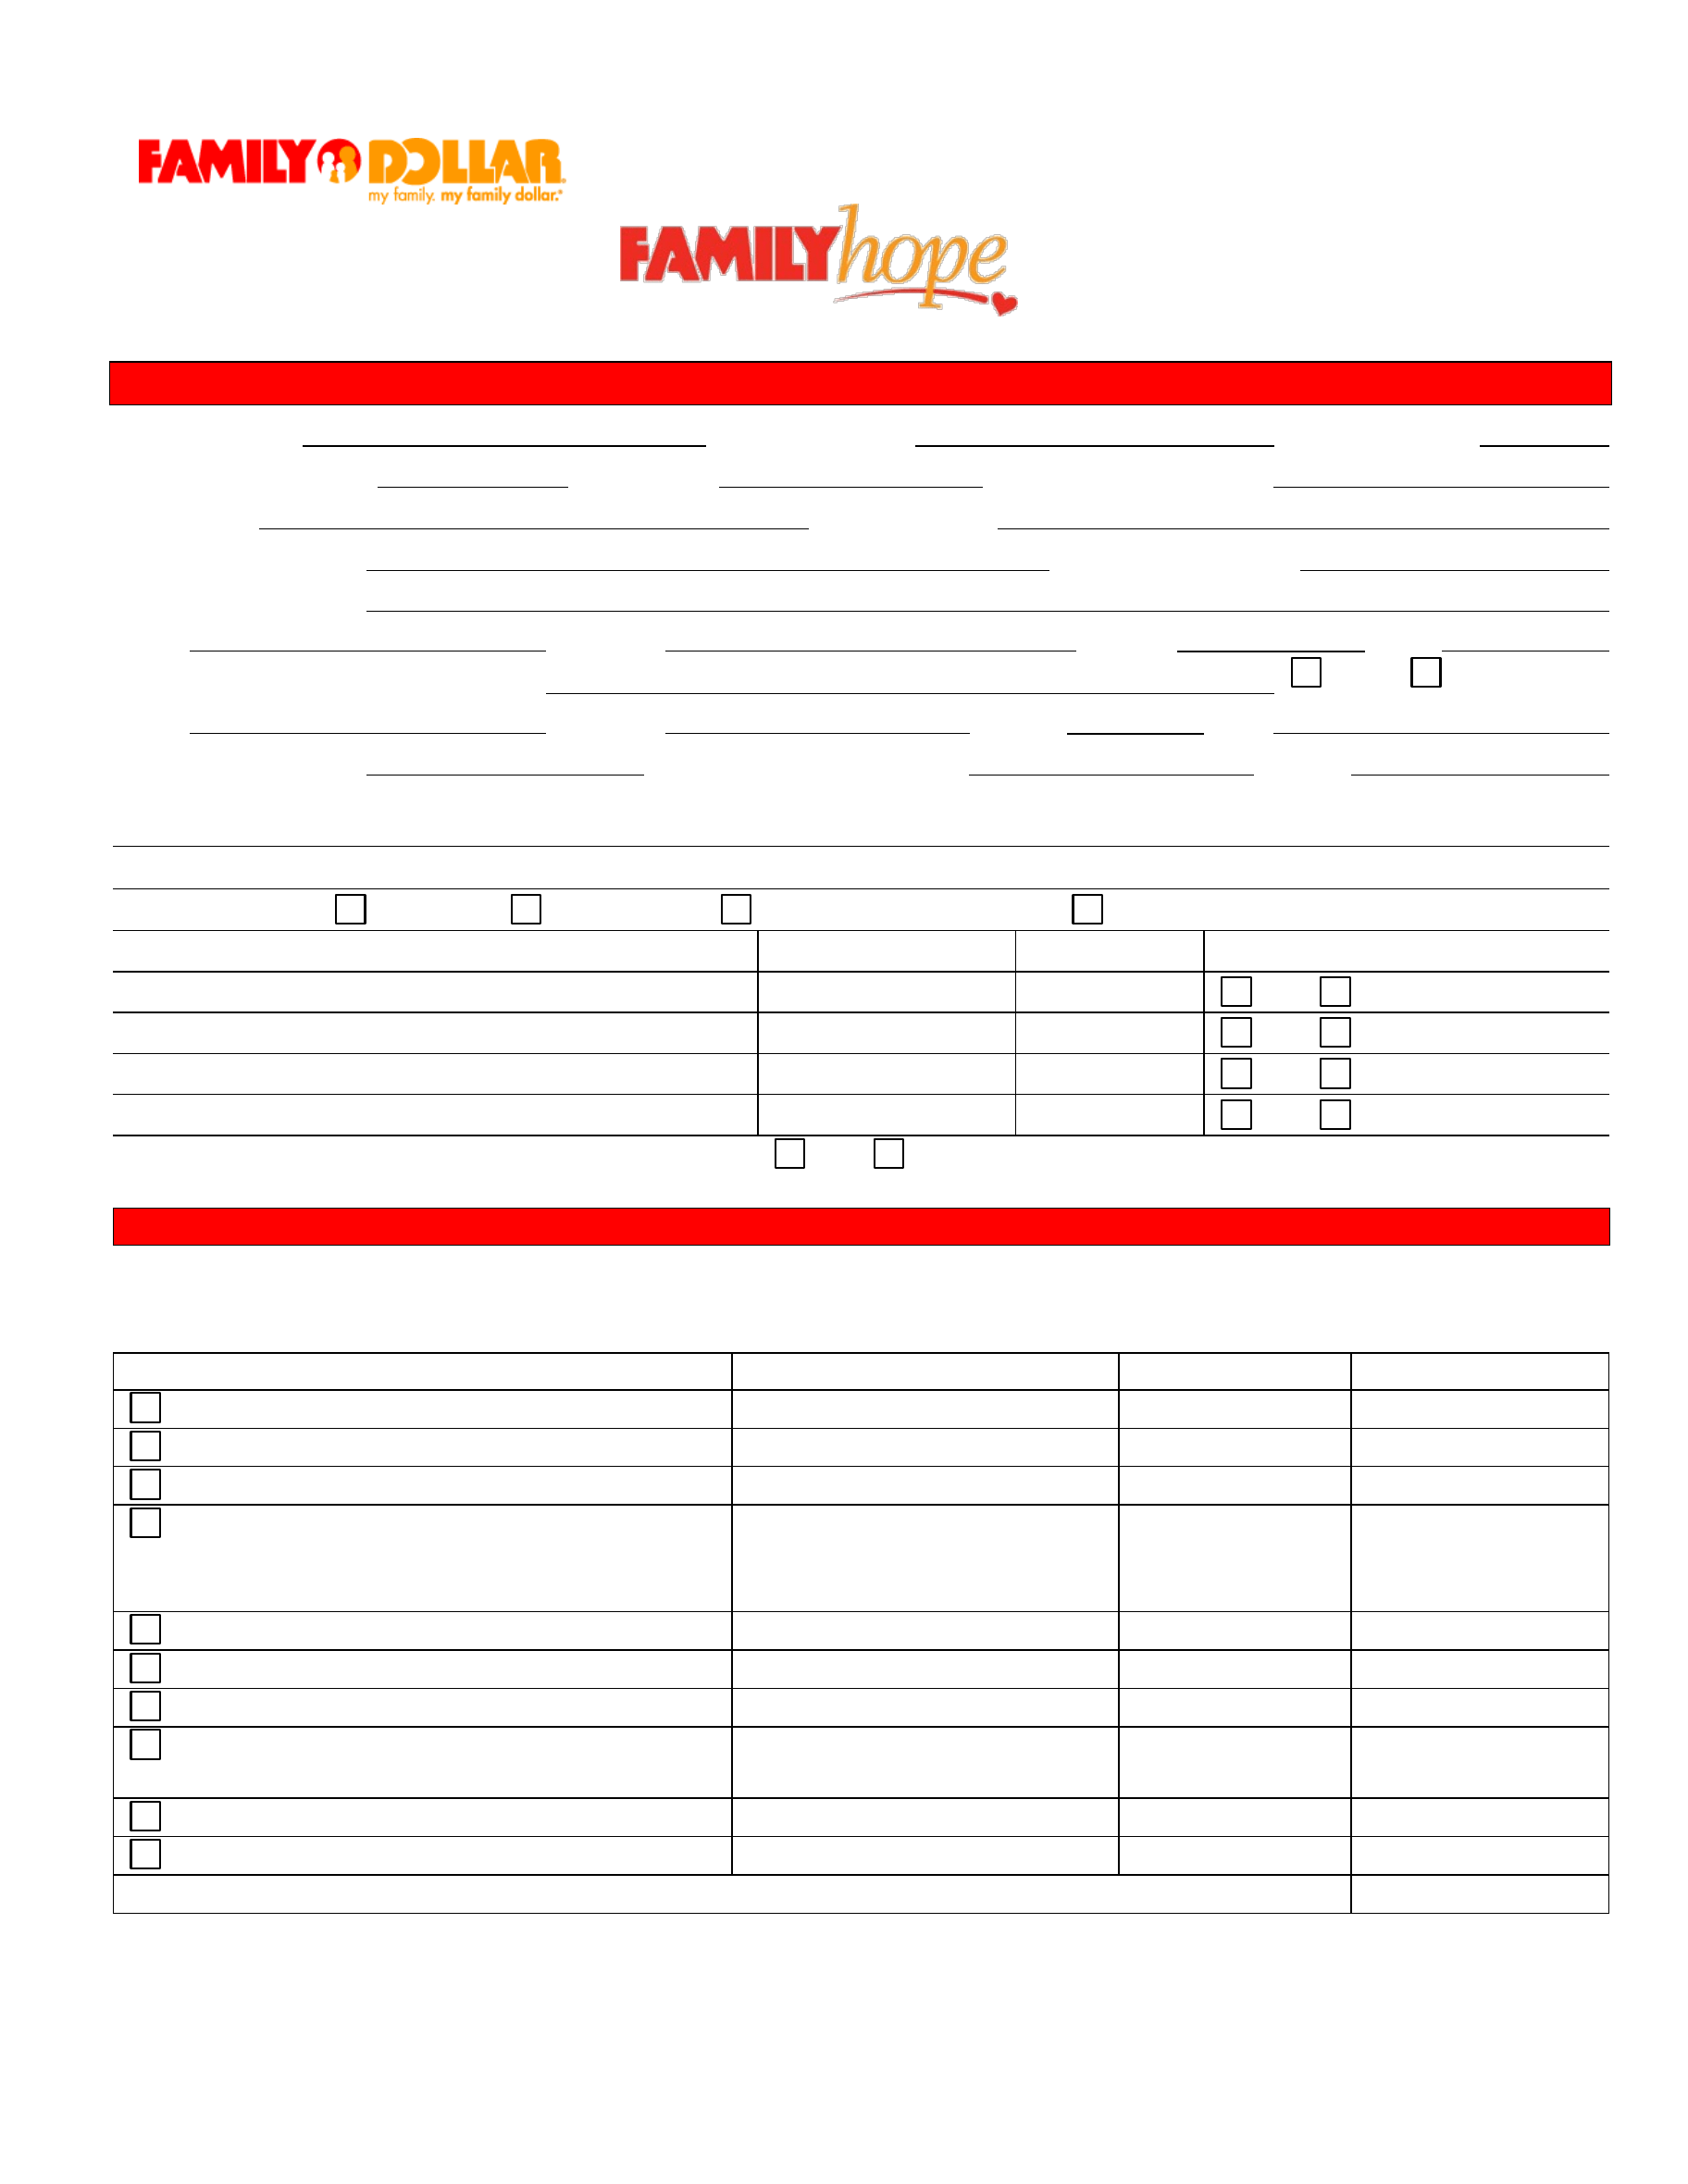 Aldi Application Form Pdf